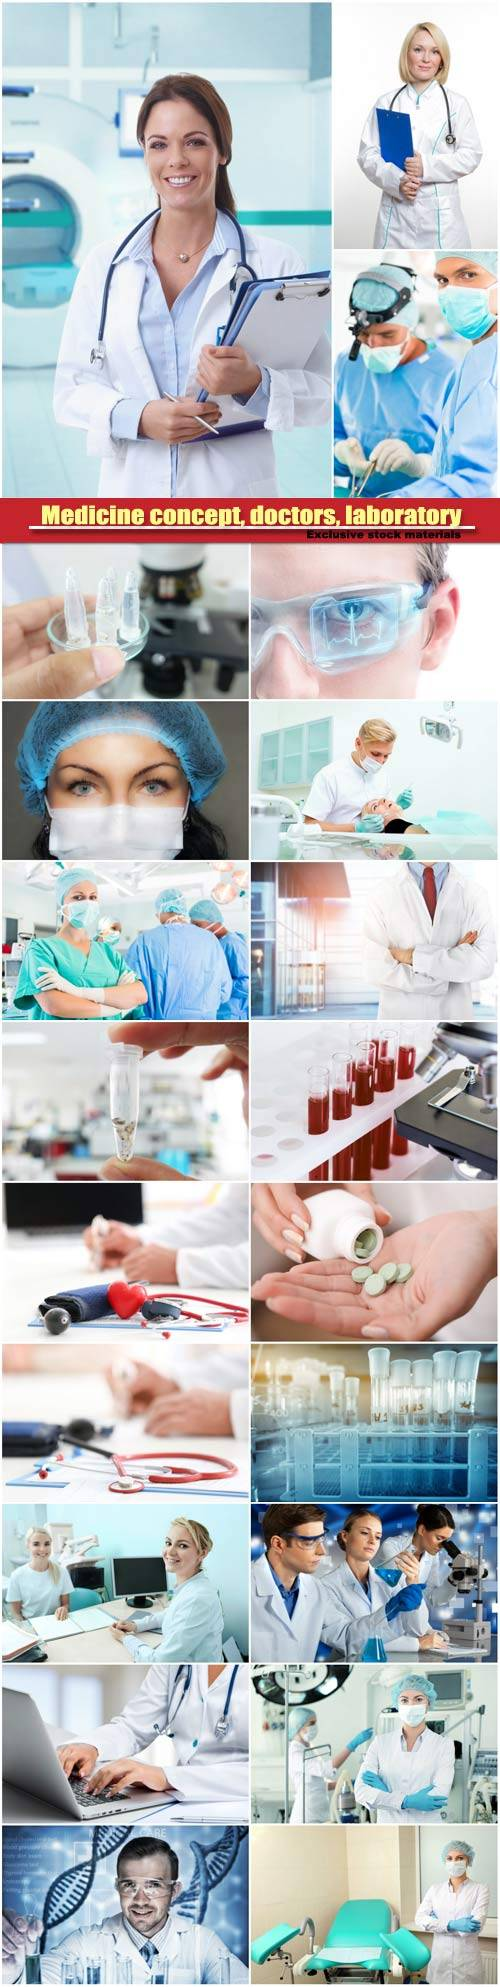 Medicine concept, doctors, laboratory